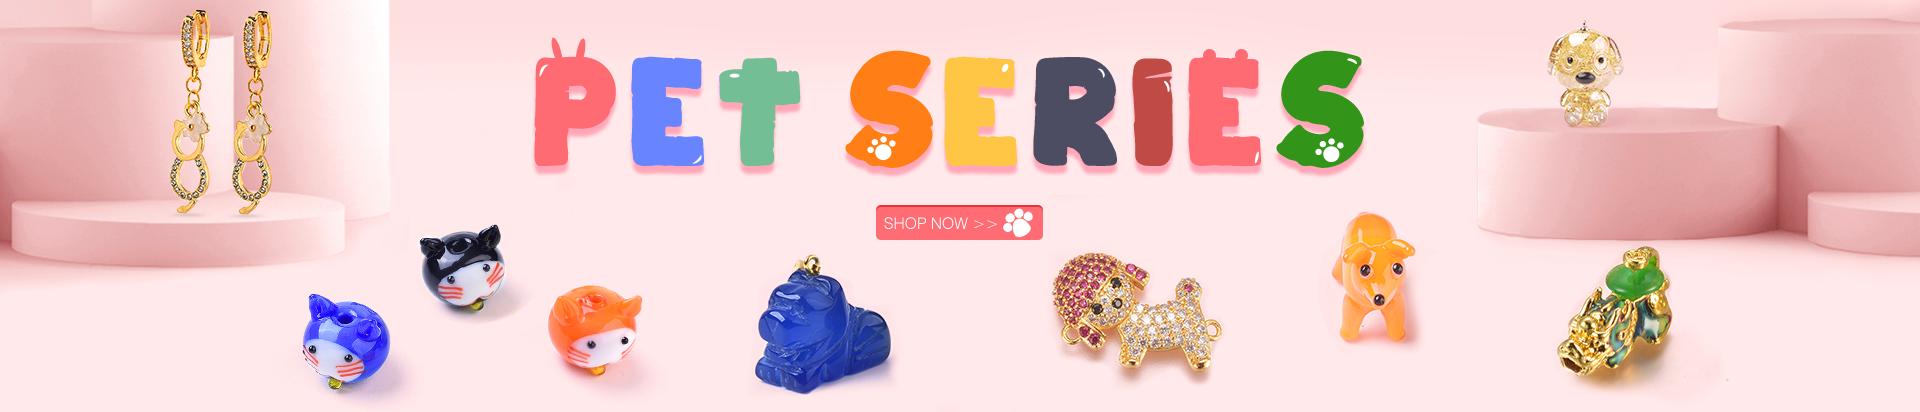 Pet Series